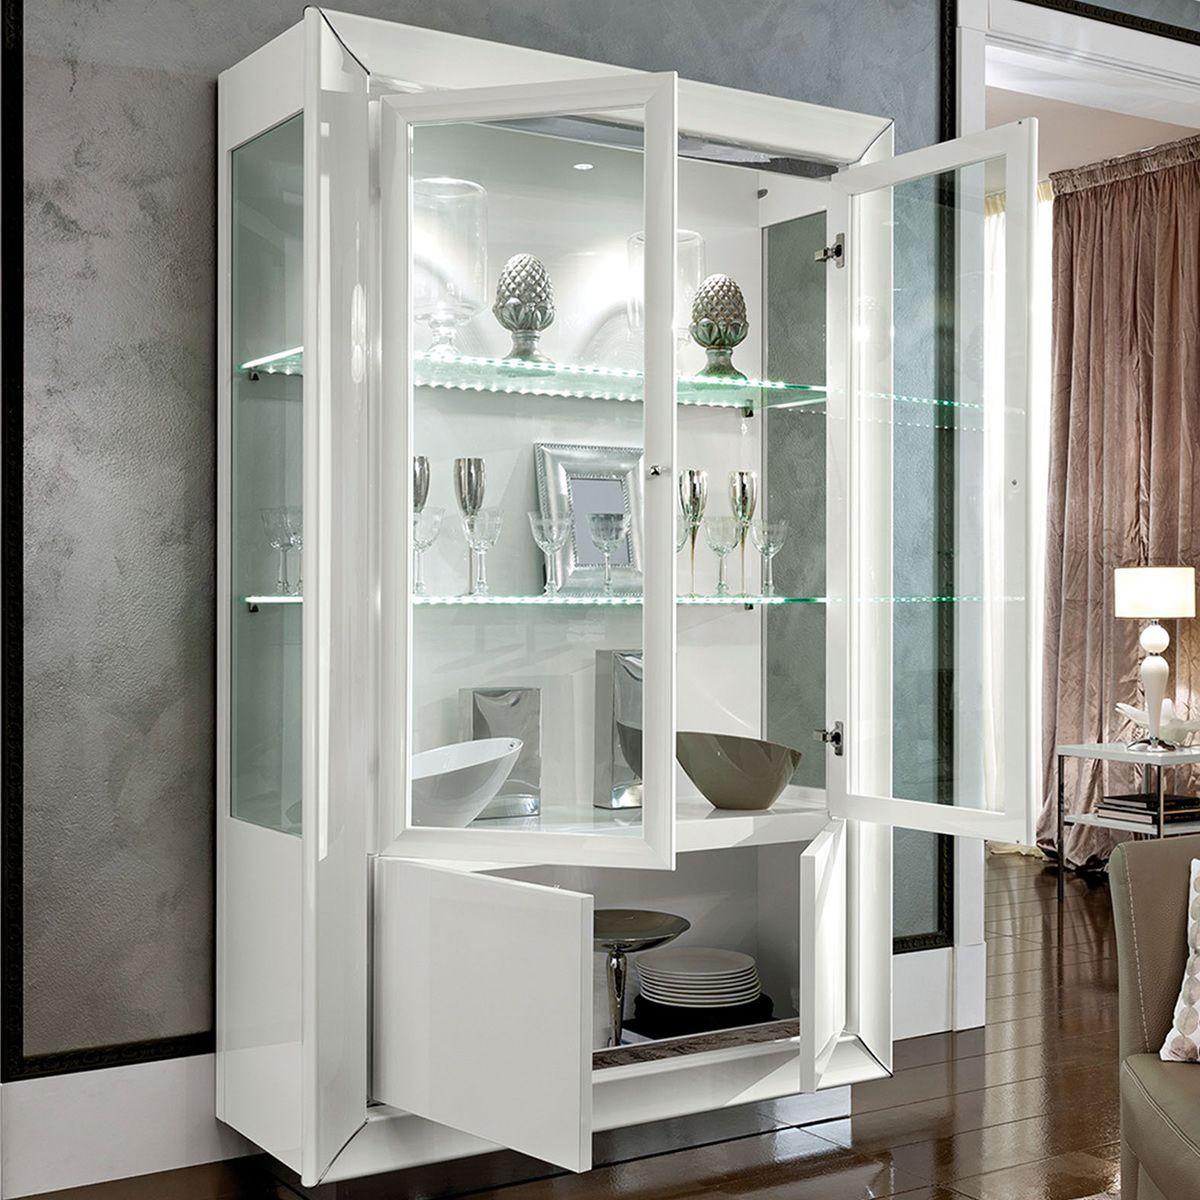 31+ Meuble rangement vaisselle salon inspirations